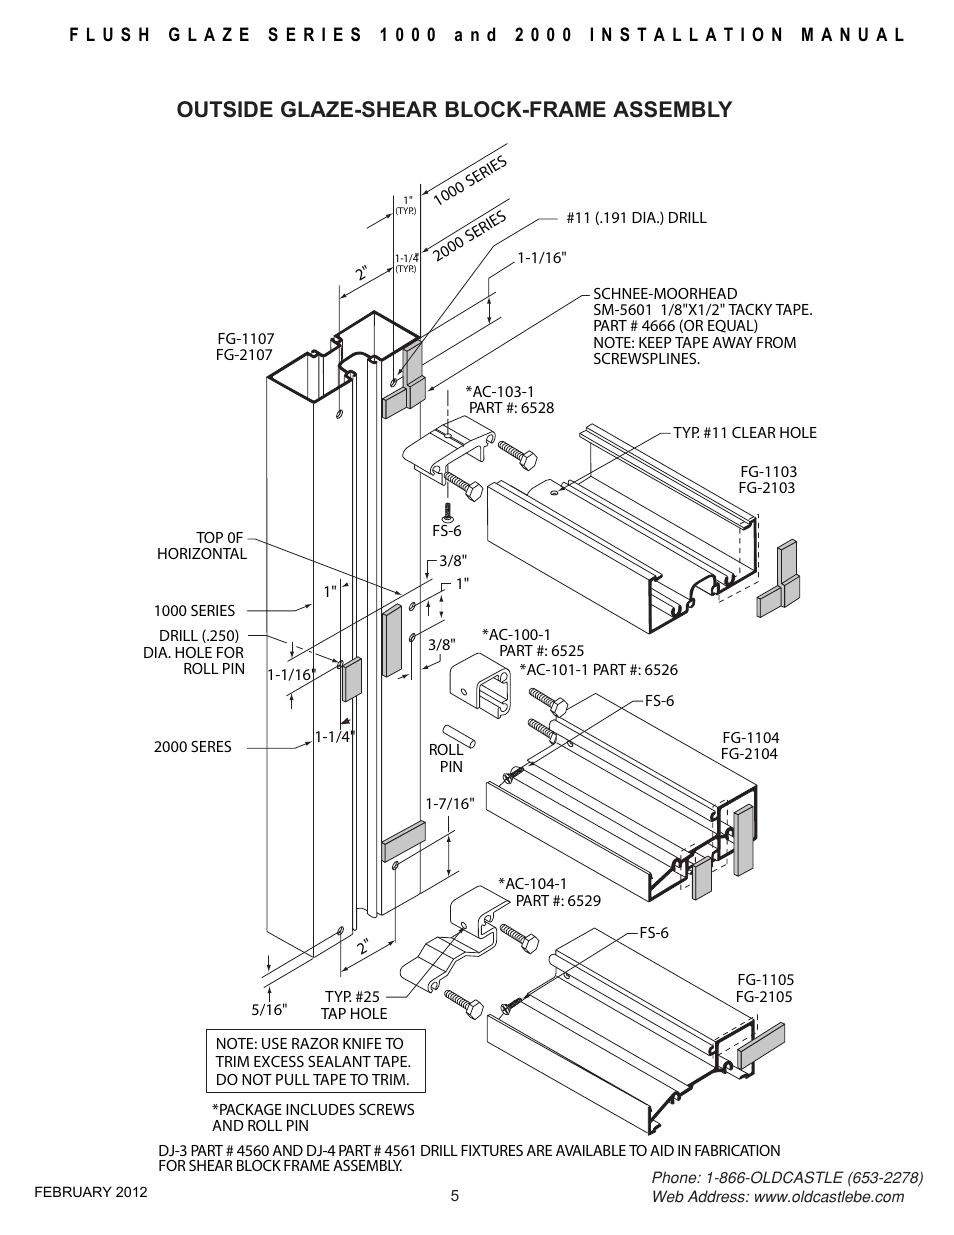 medium resolution of frame assy outside glaze outside glaze shear block frame assembly oldcastle buildingenvelope fg 2000 user manual page 6 27